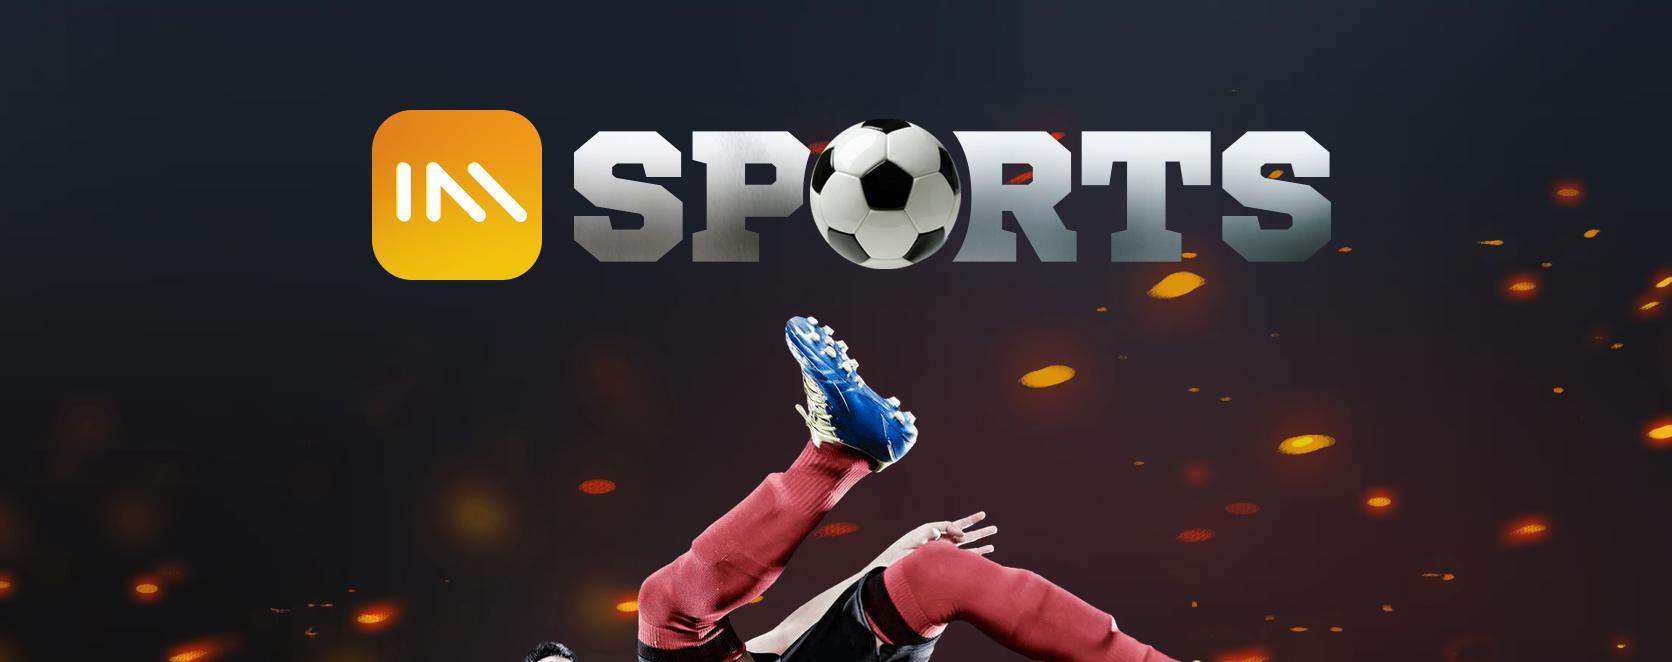 IMsports Logo